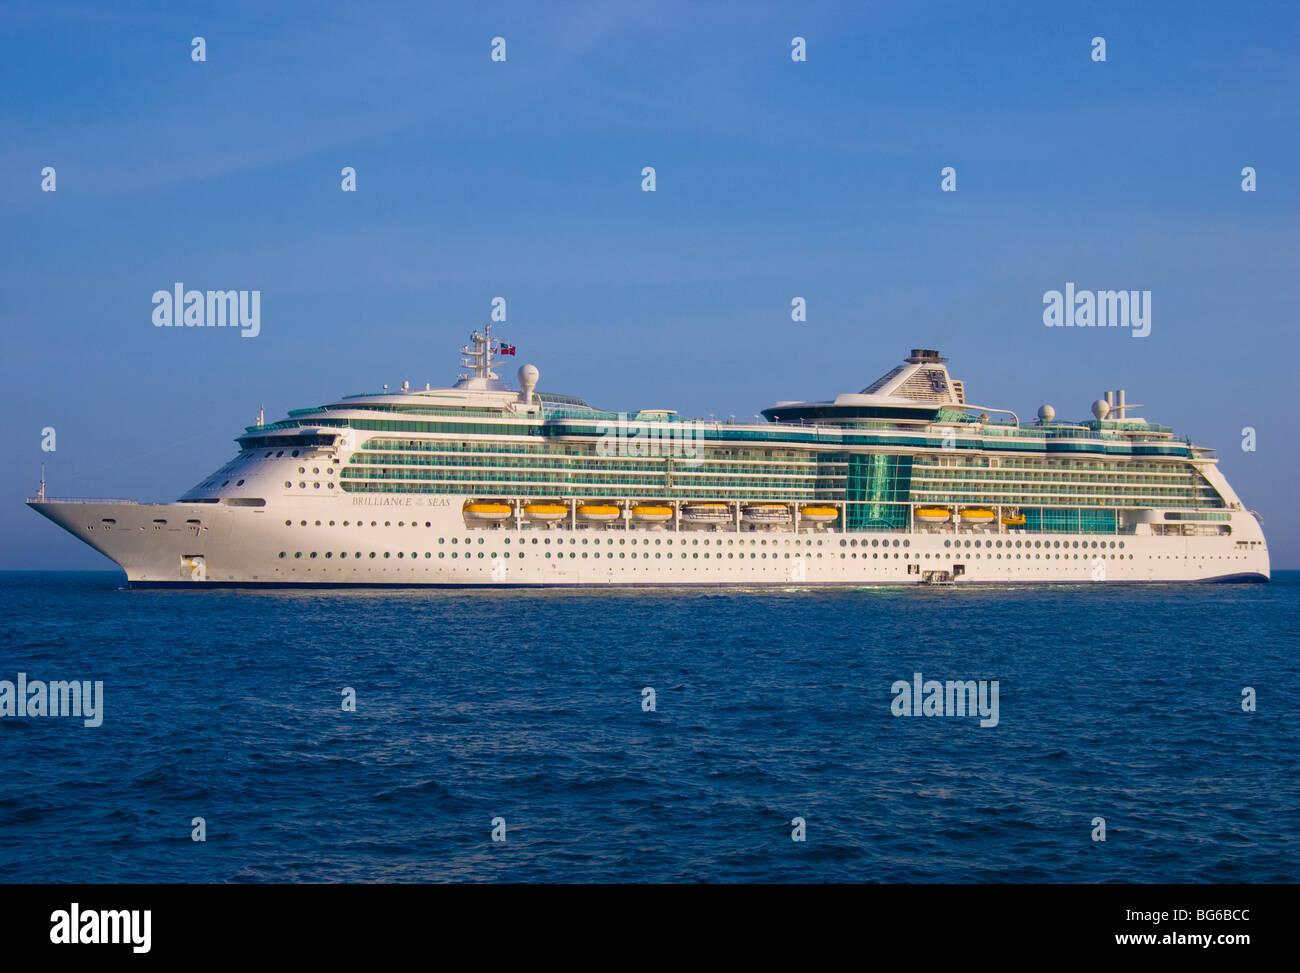 Royal Caribbeans 'Brilliance of the Seas' anchored at sea. - Stock Image